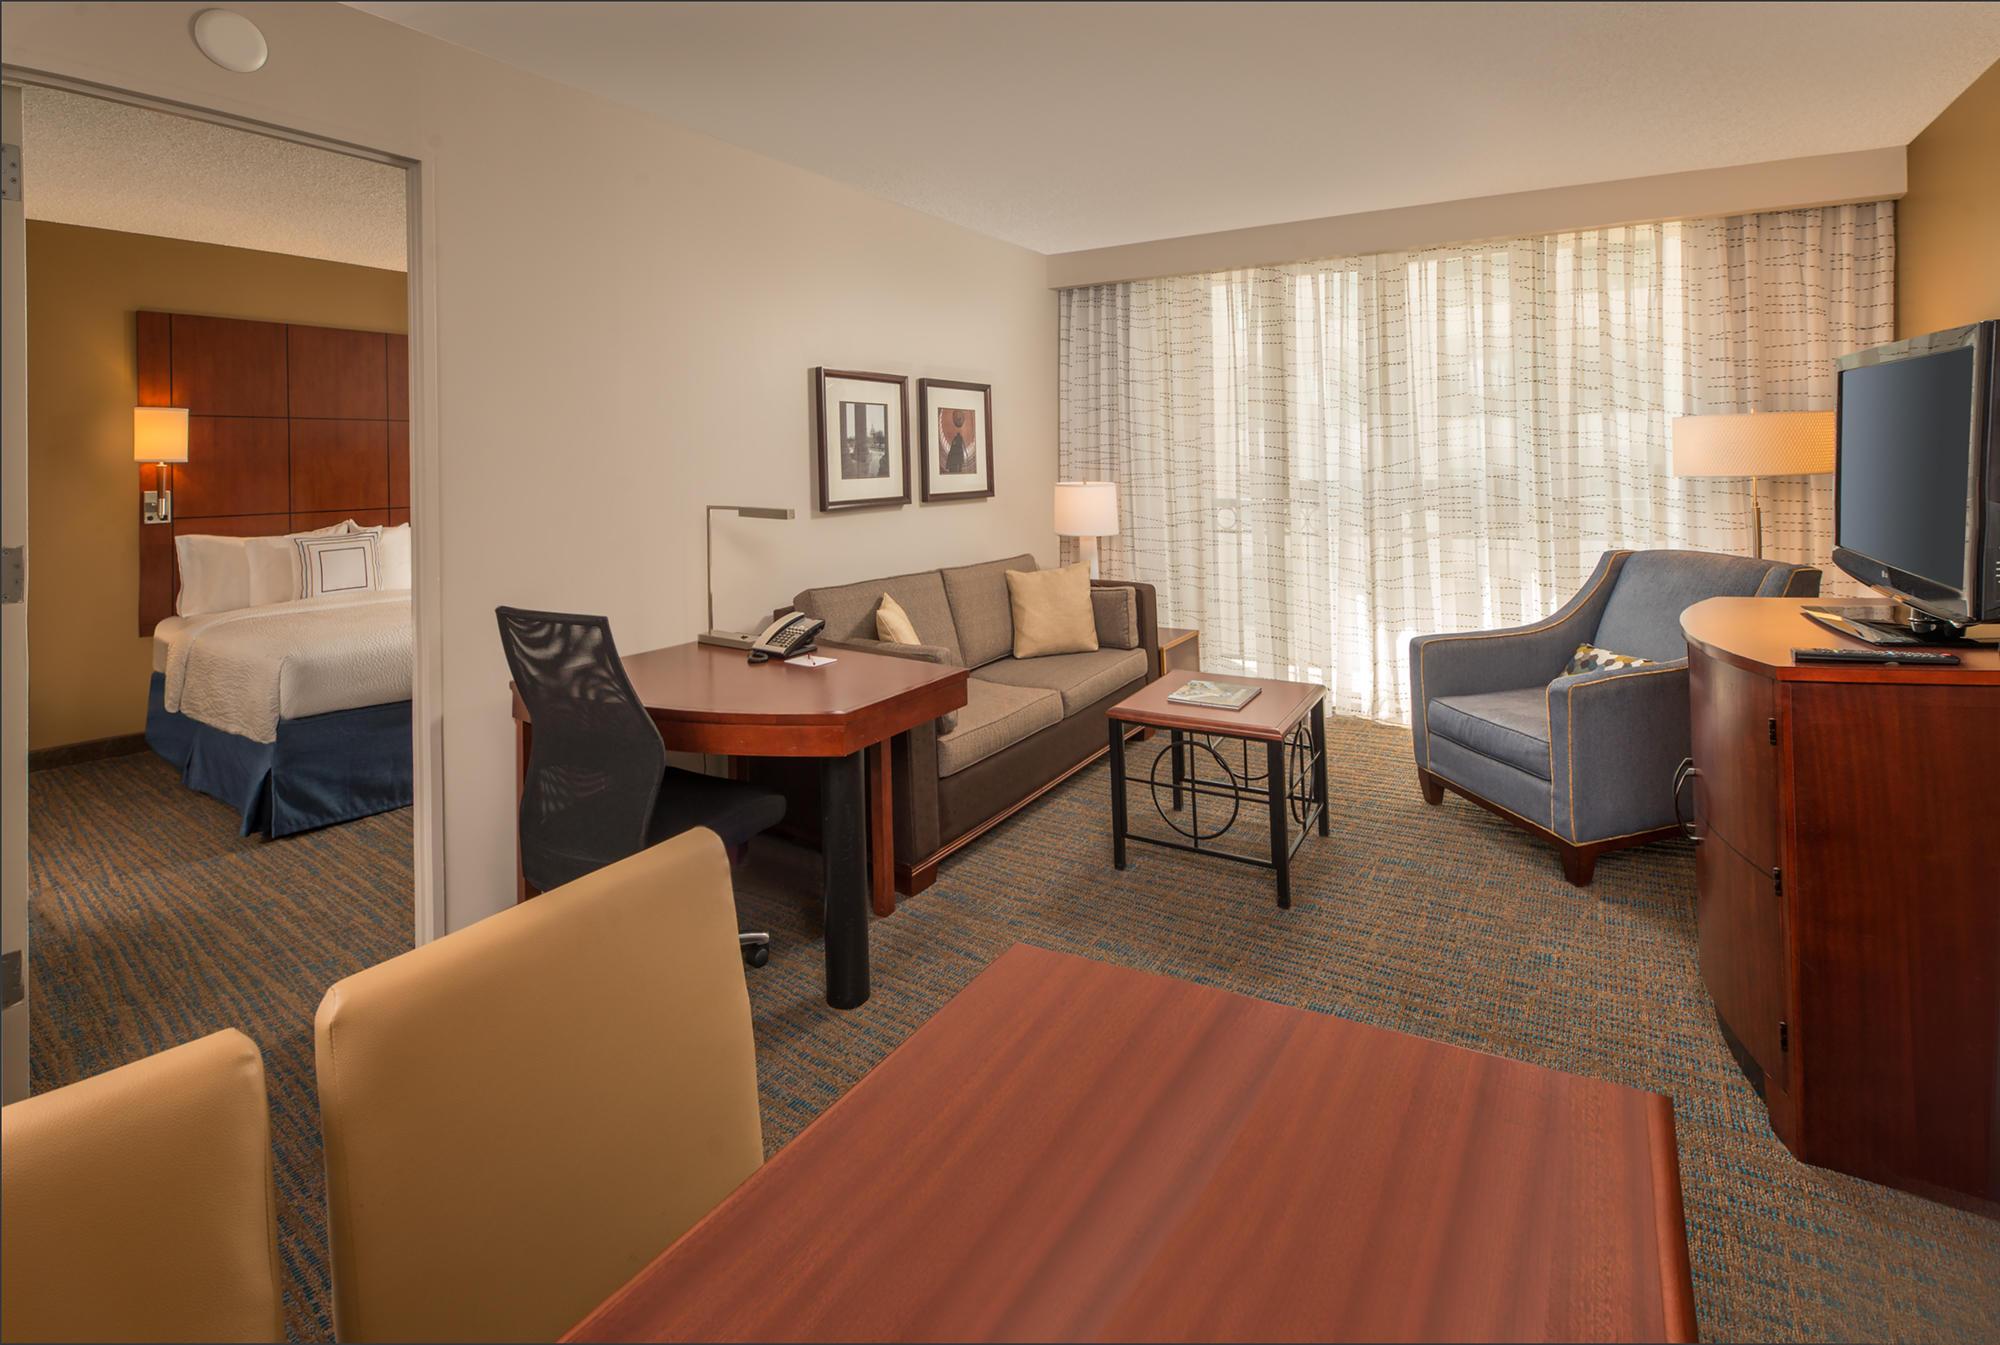 Washington Court Hotel Room Service